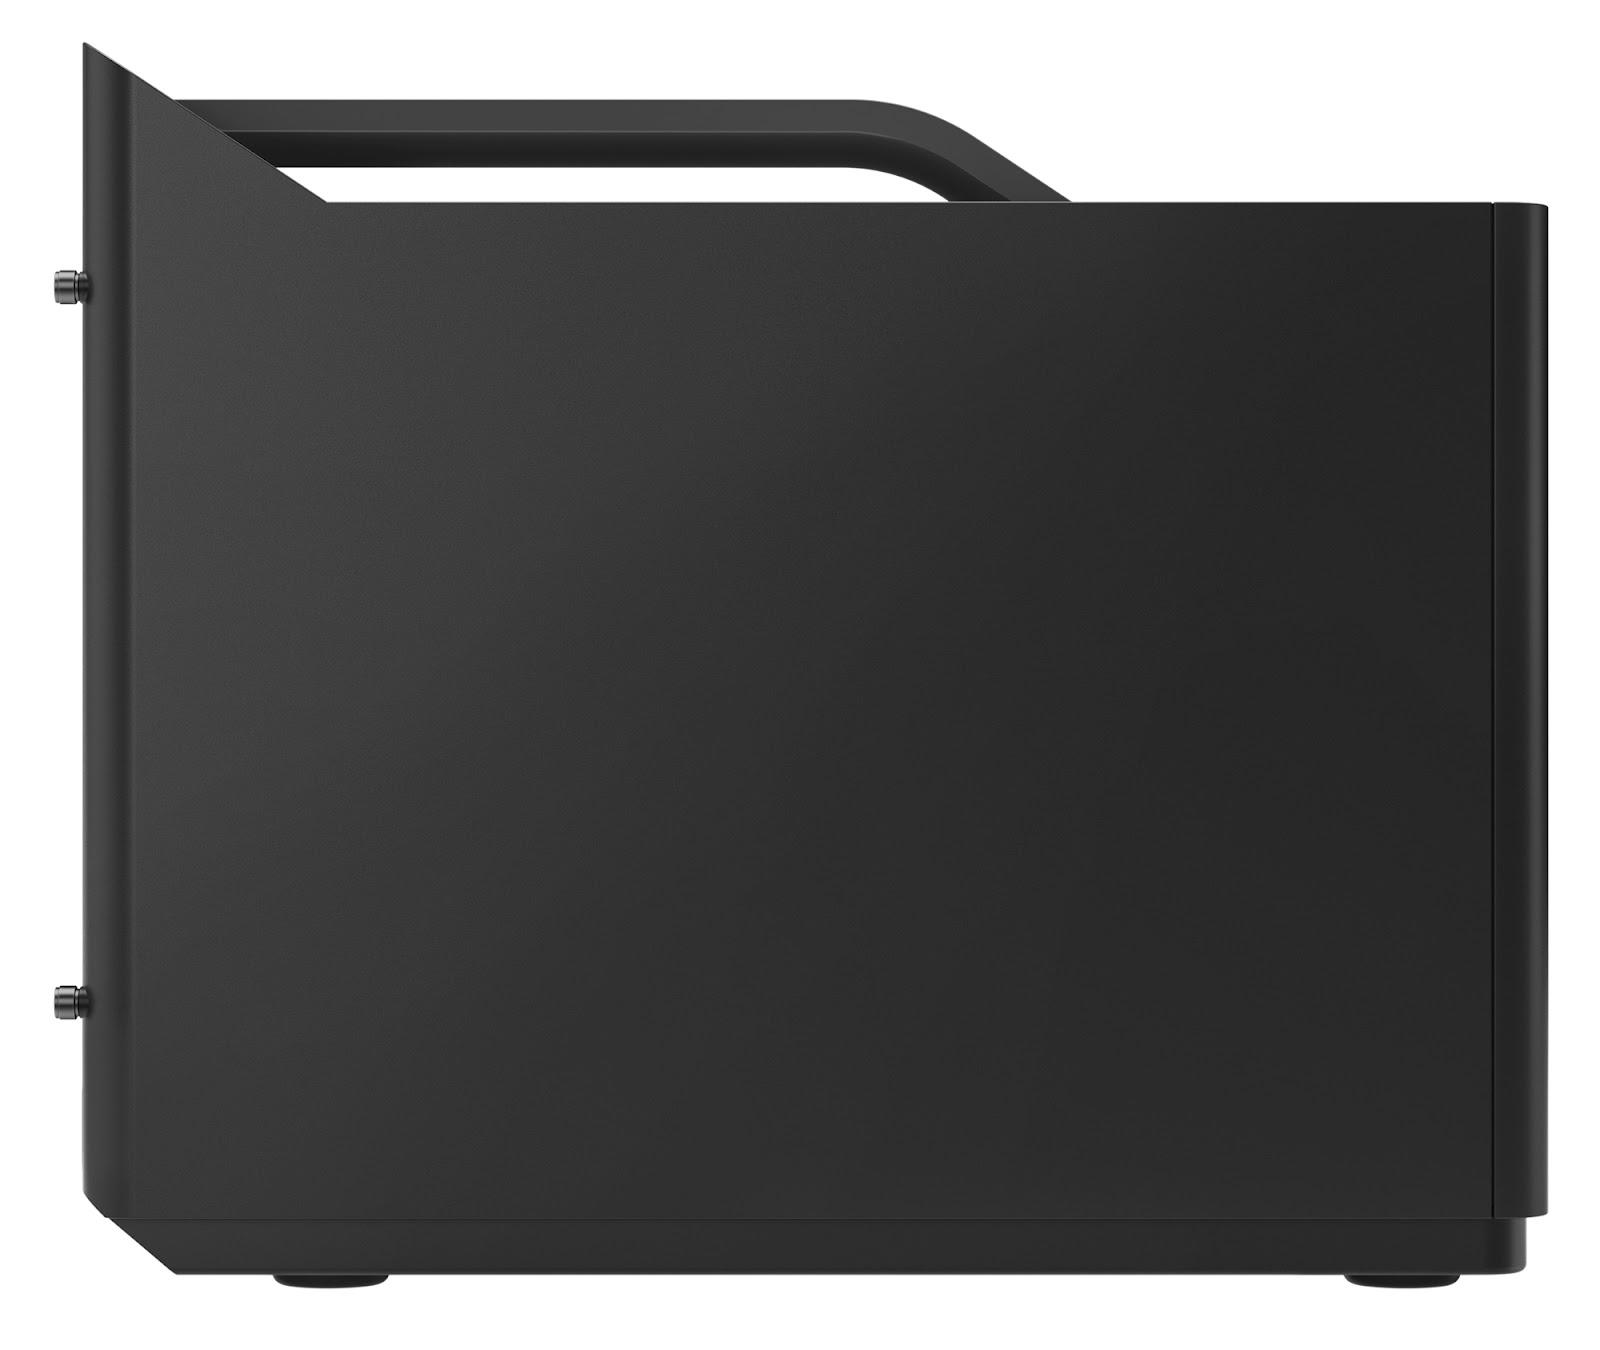 Фото 2. Компьютер Lenovo Legion C730 Cube (90JH001LUA)